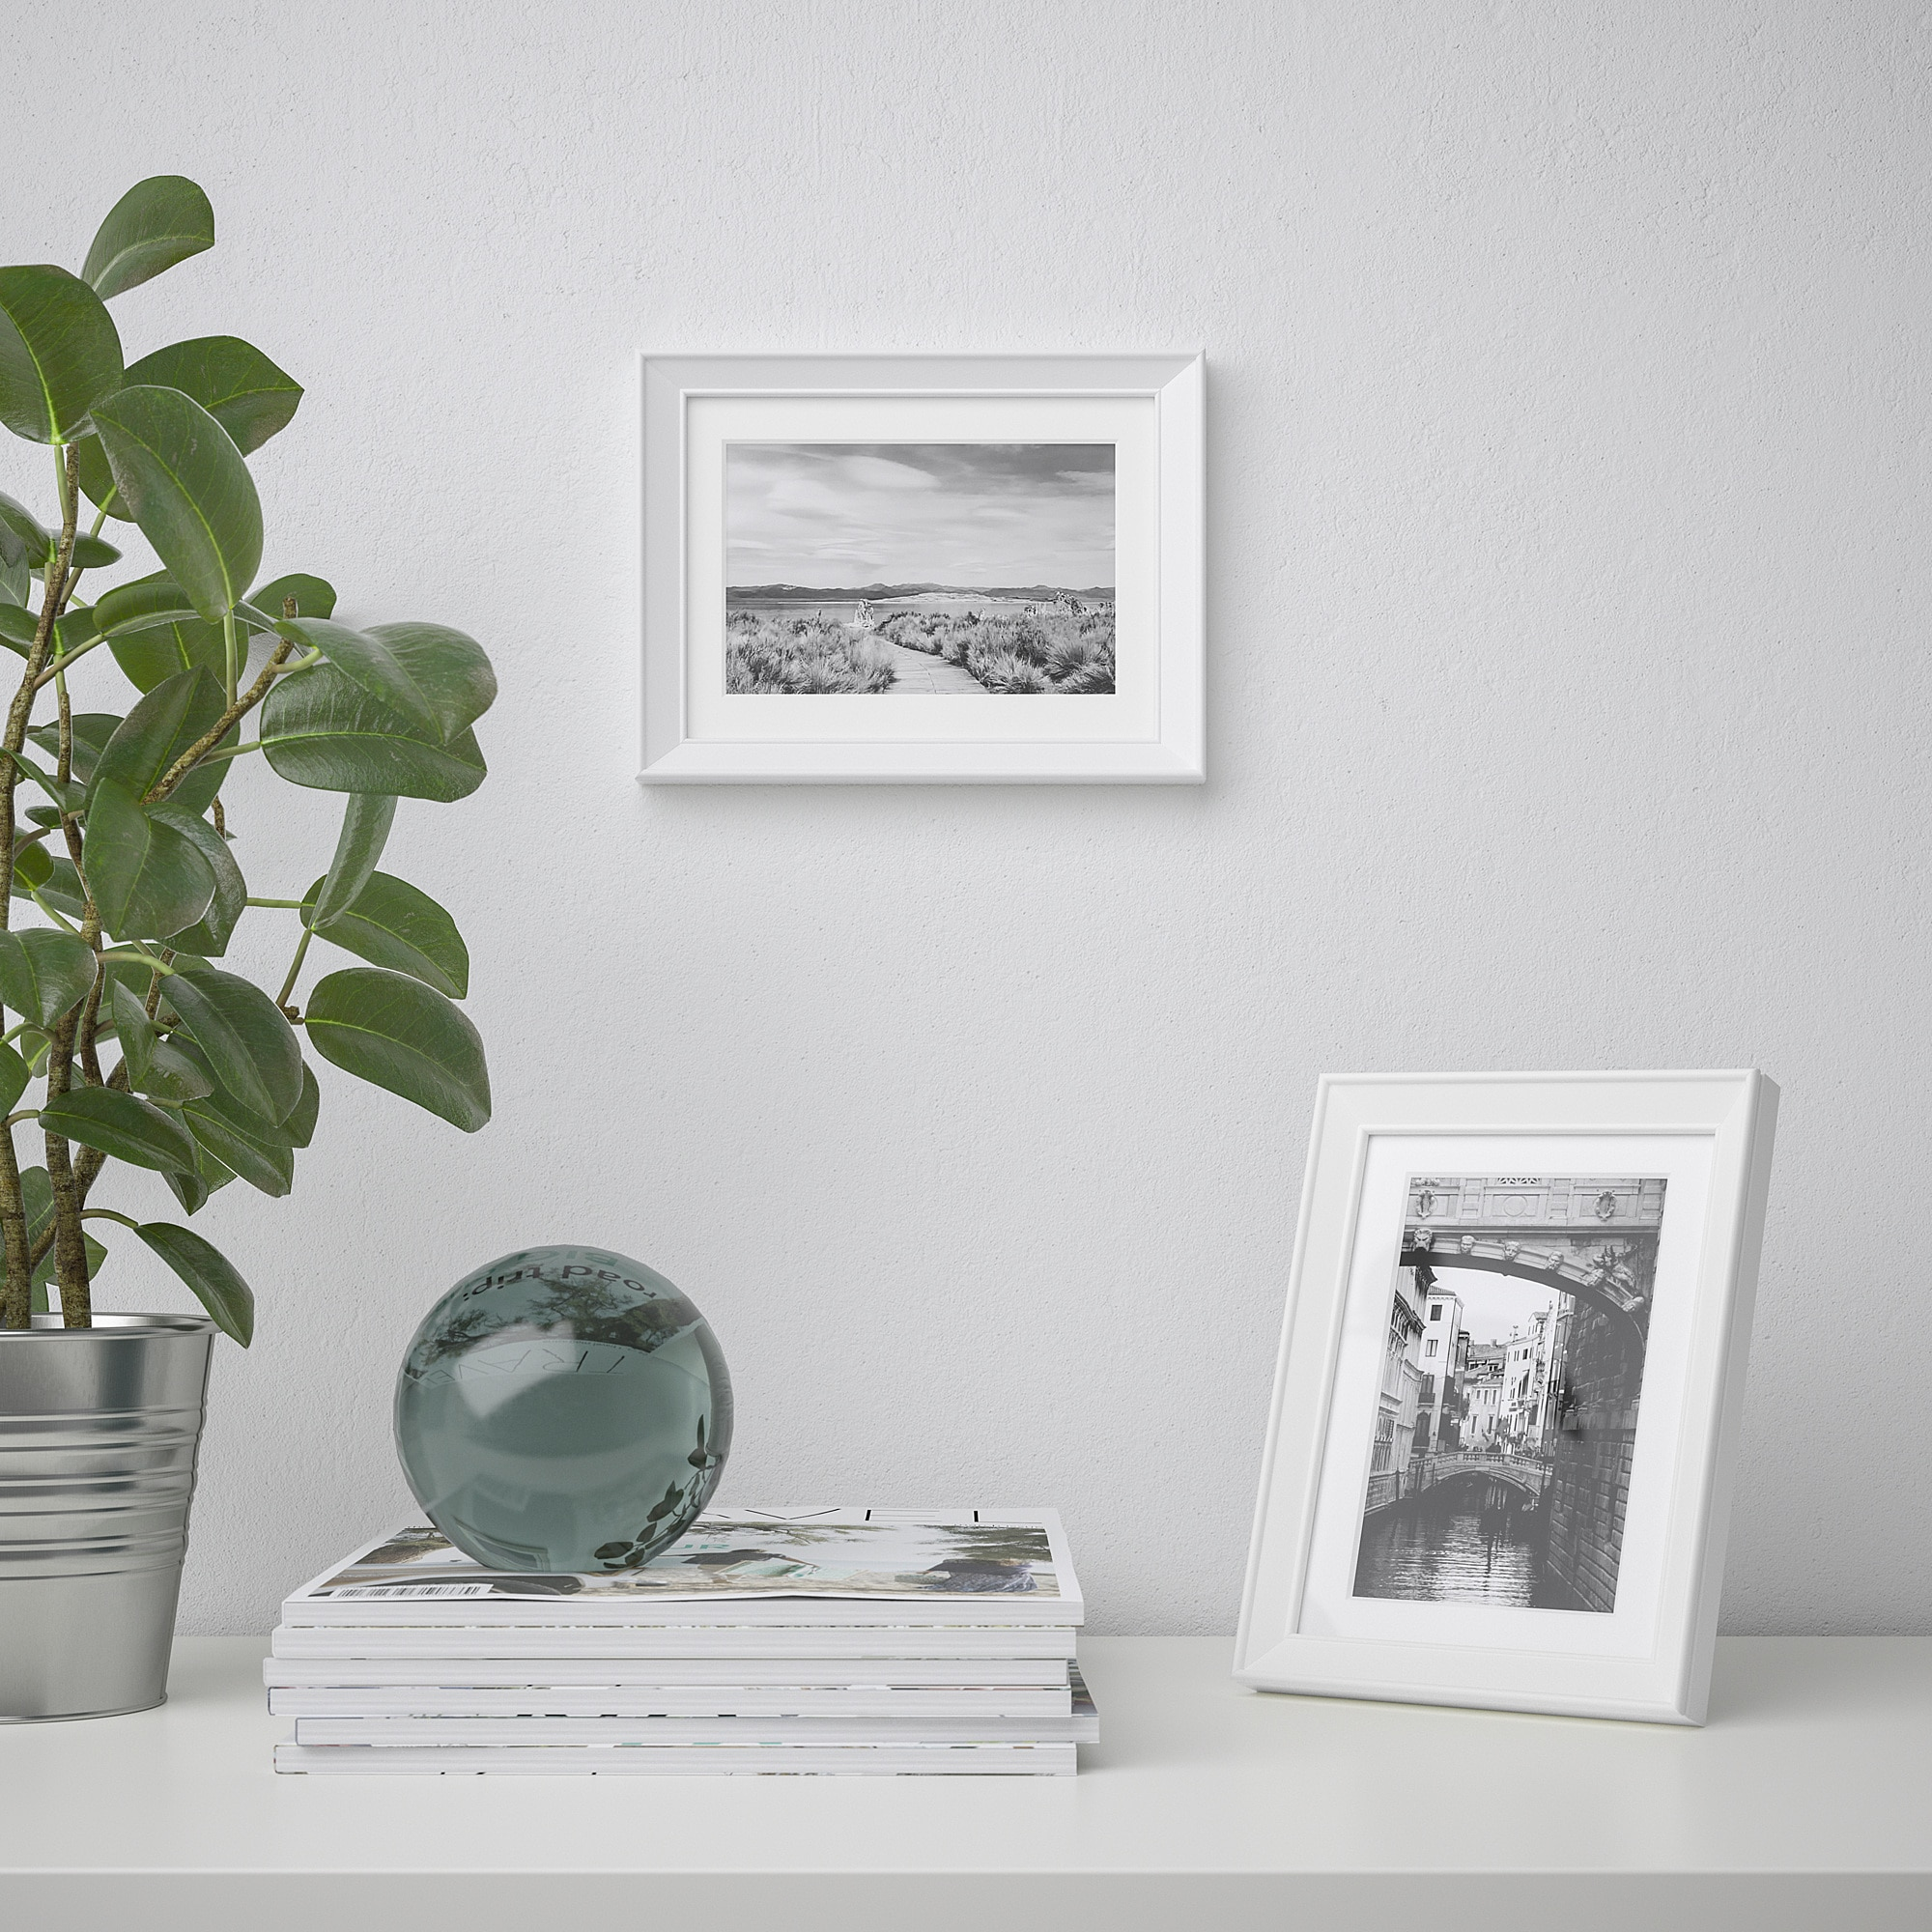 KNOPPÄNG Rahmen weiß | Ikea, Fotorahmen und Ikea rahmen